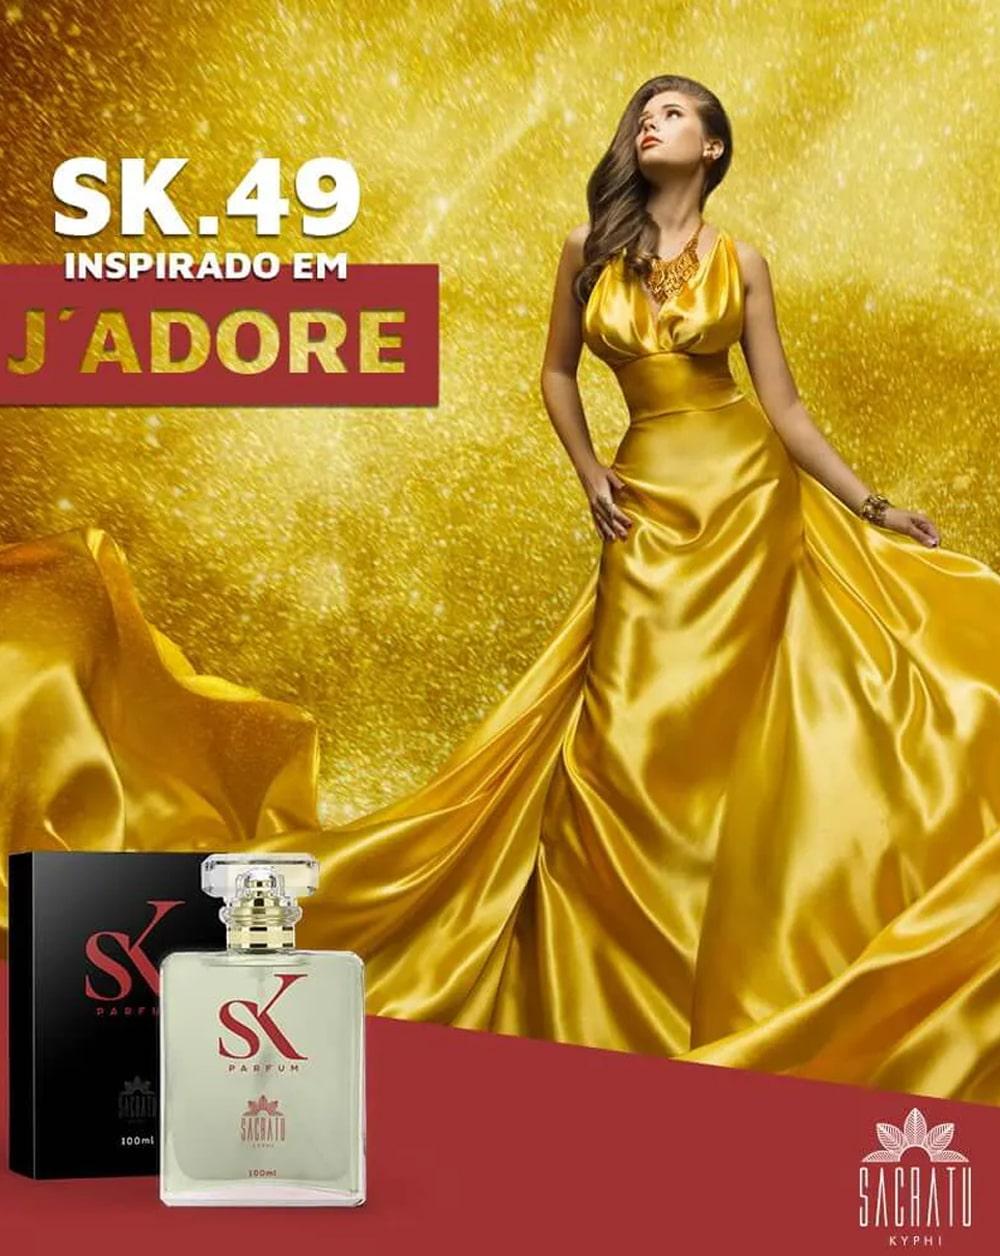 SK 49 Inspirado no J Adore by Dior